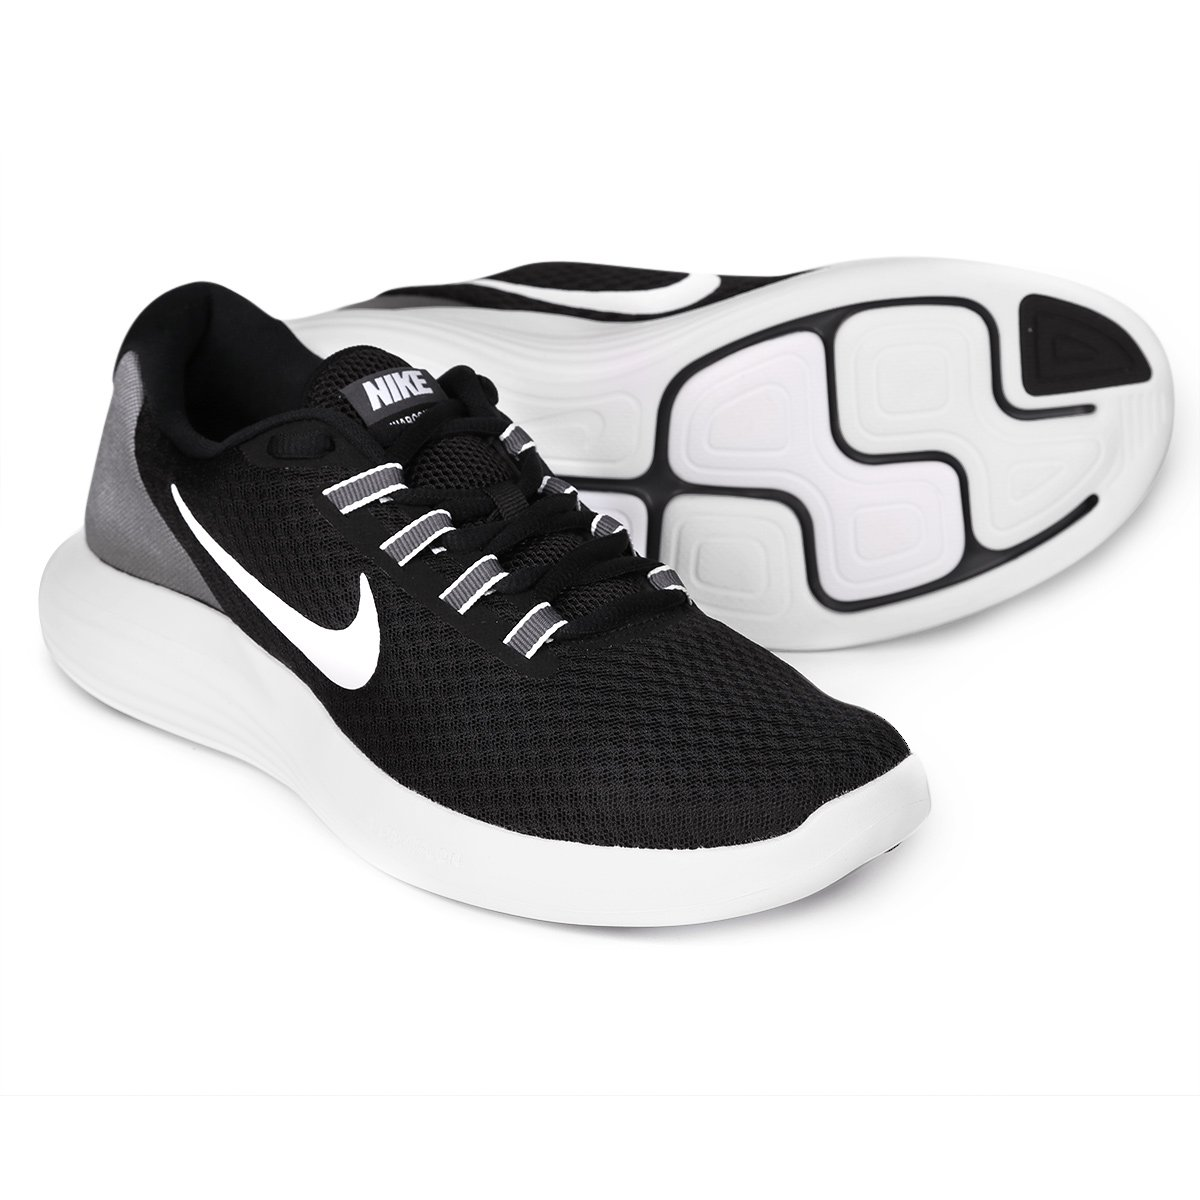 08d1aaa4427 Tênis Nike Lunarconverge Masculino - Compre Agora